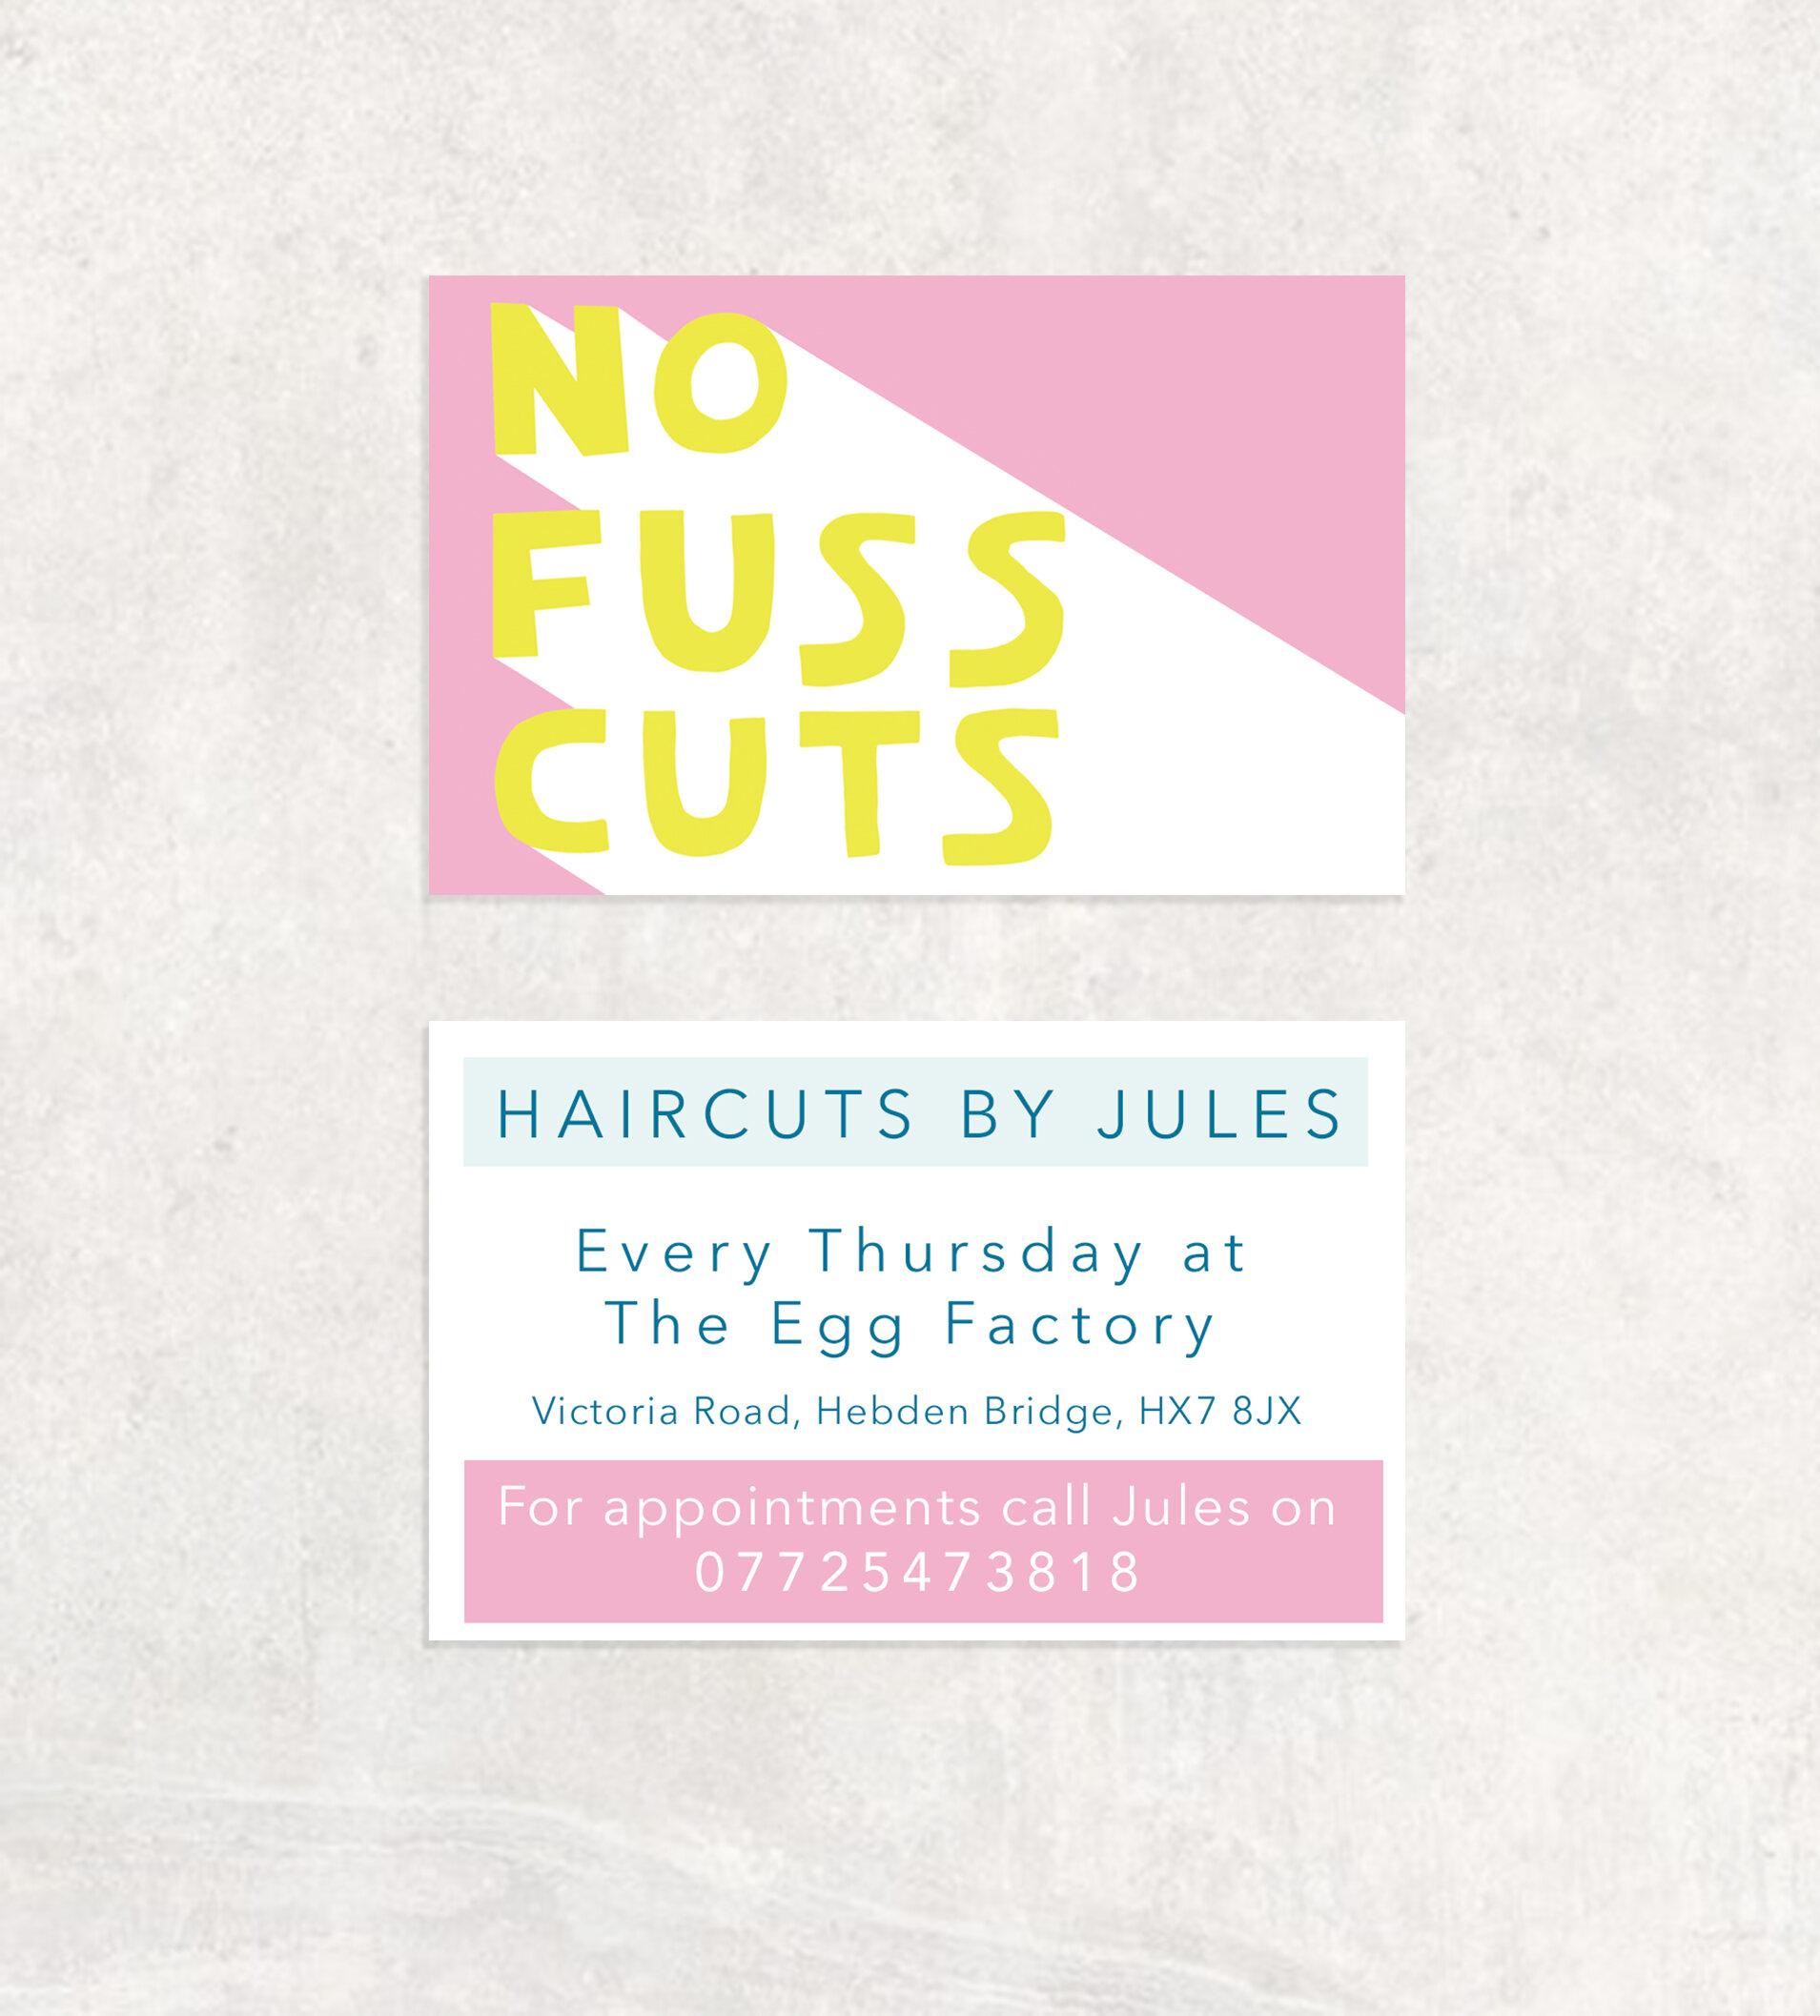 Logo and business card design for Jules Davis